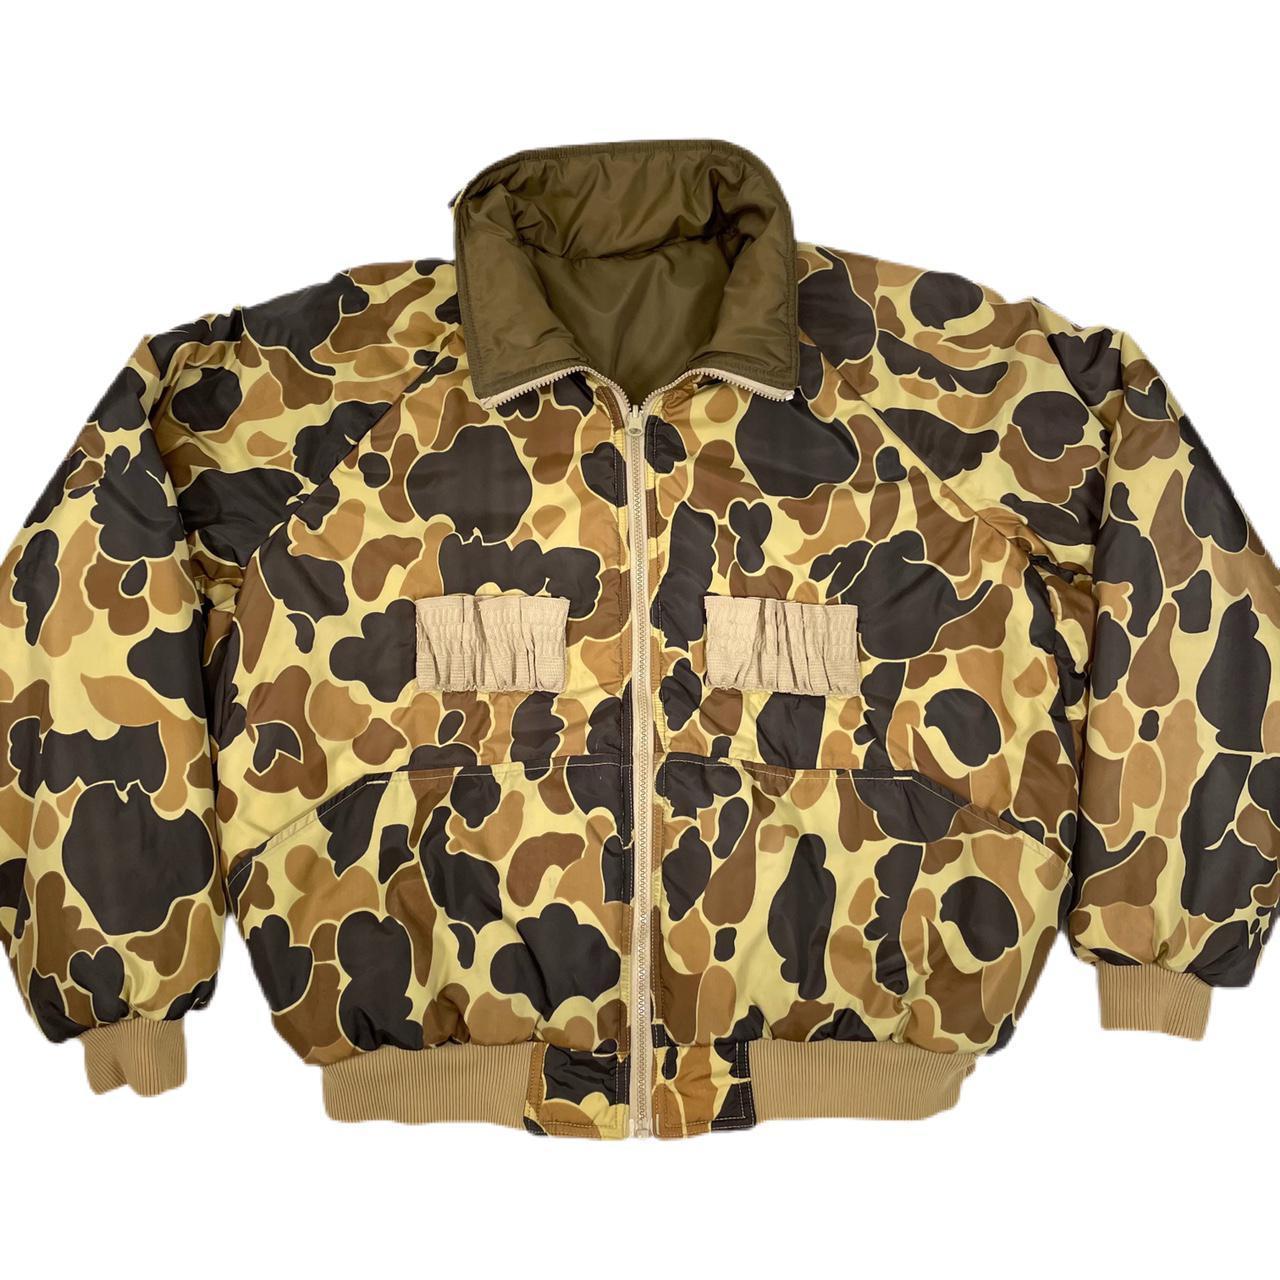 Product Image 1 - Columbia Sportswear Thinsulate duck camo